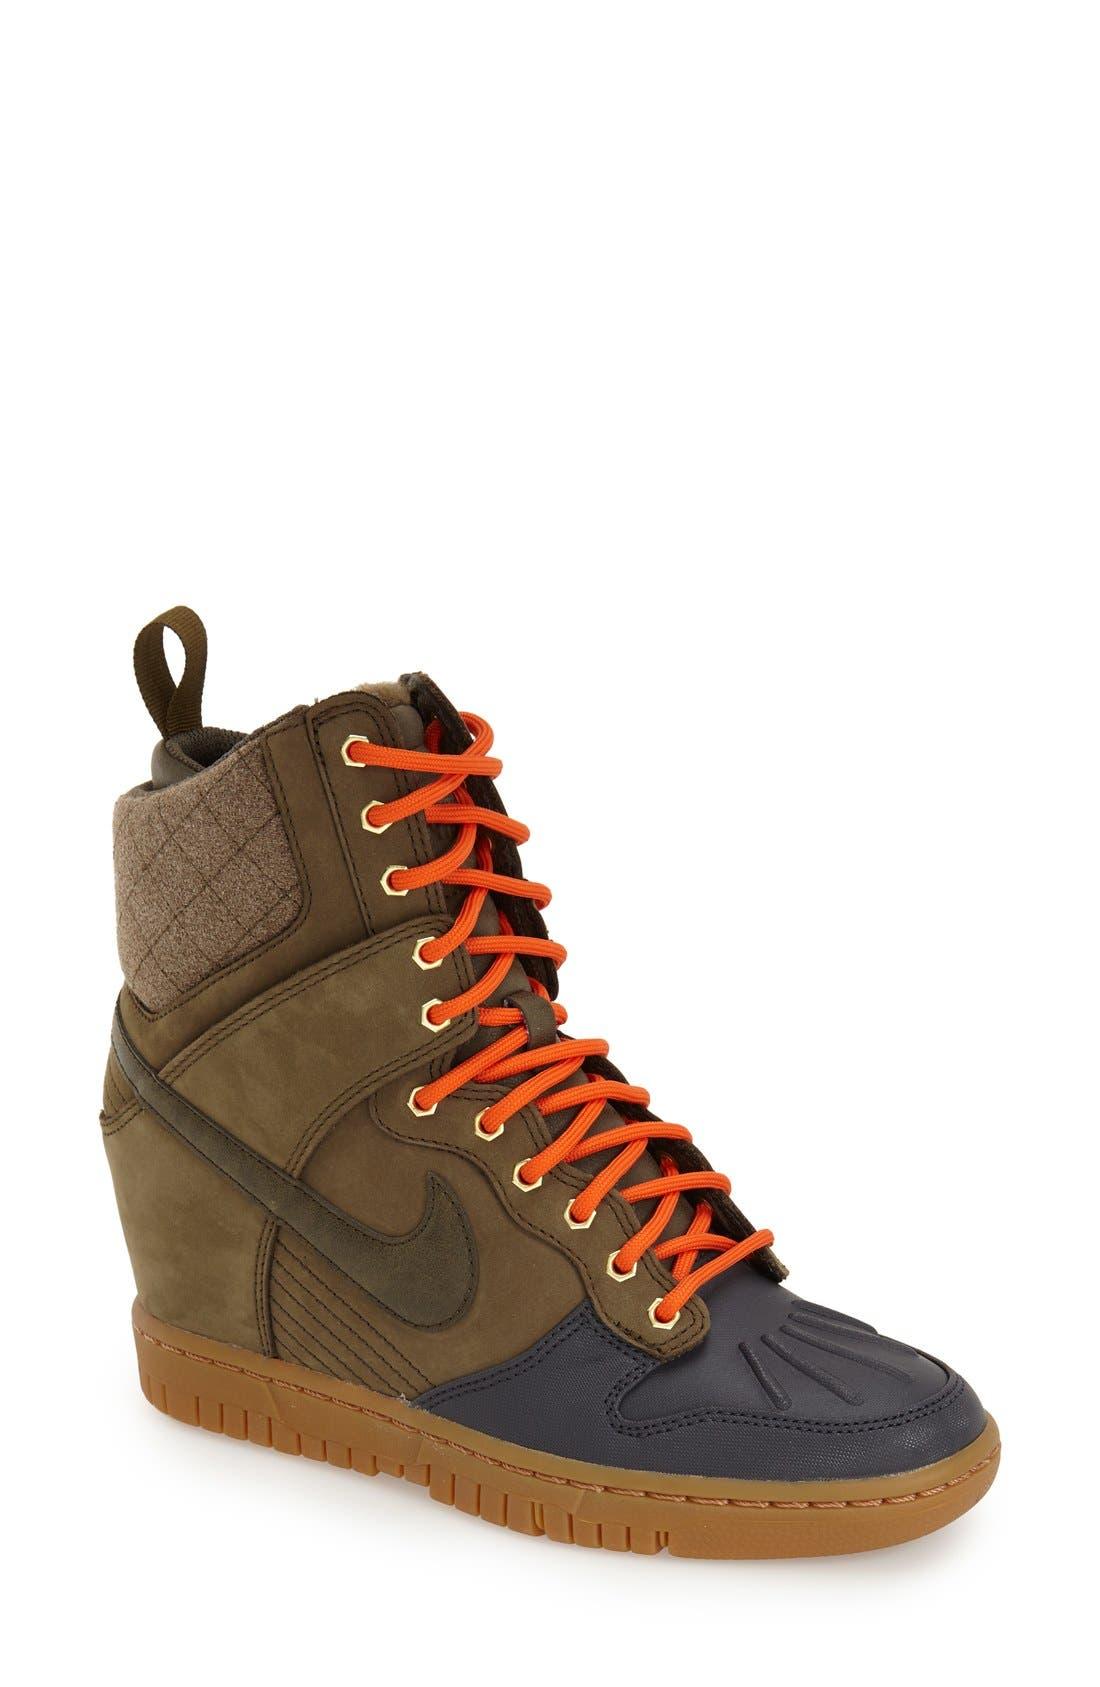 Ski Hi Nike With Wedges For Women Nike Dunk Sky Hi Black Snake ... 5fb4b4f08d